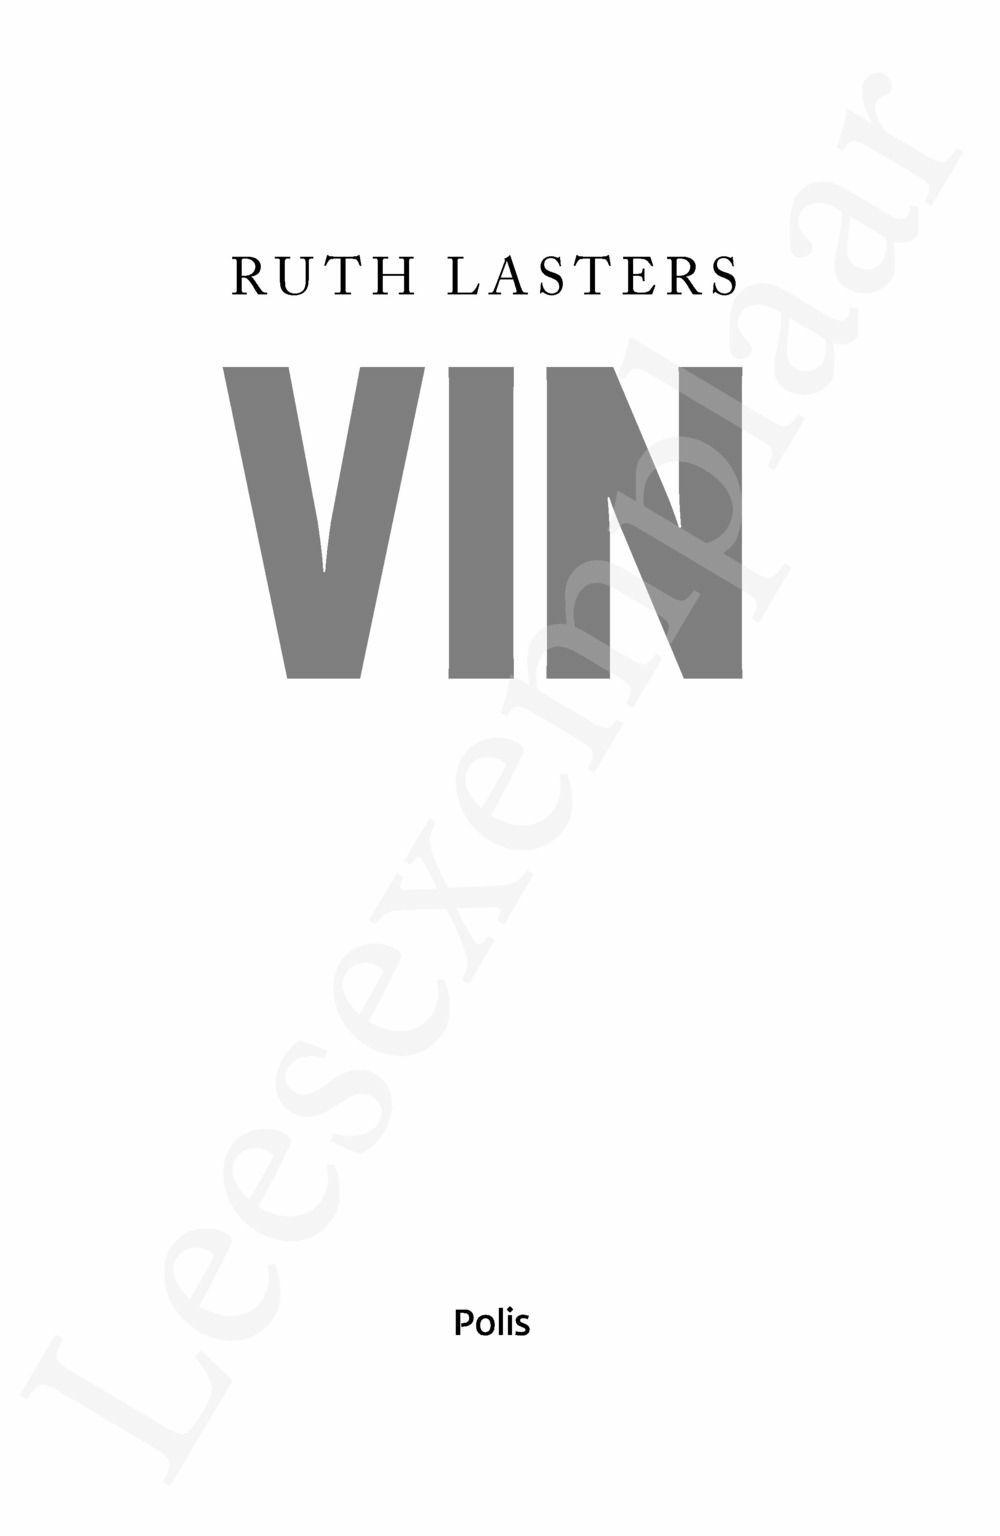 Preview: Vin